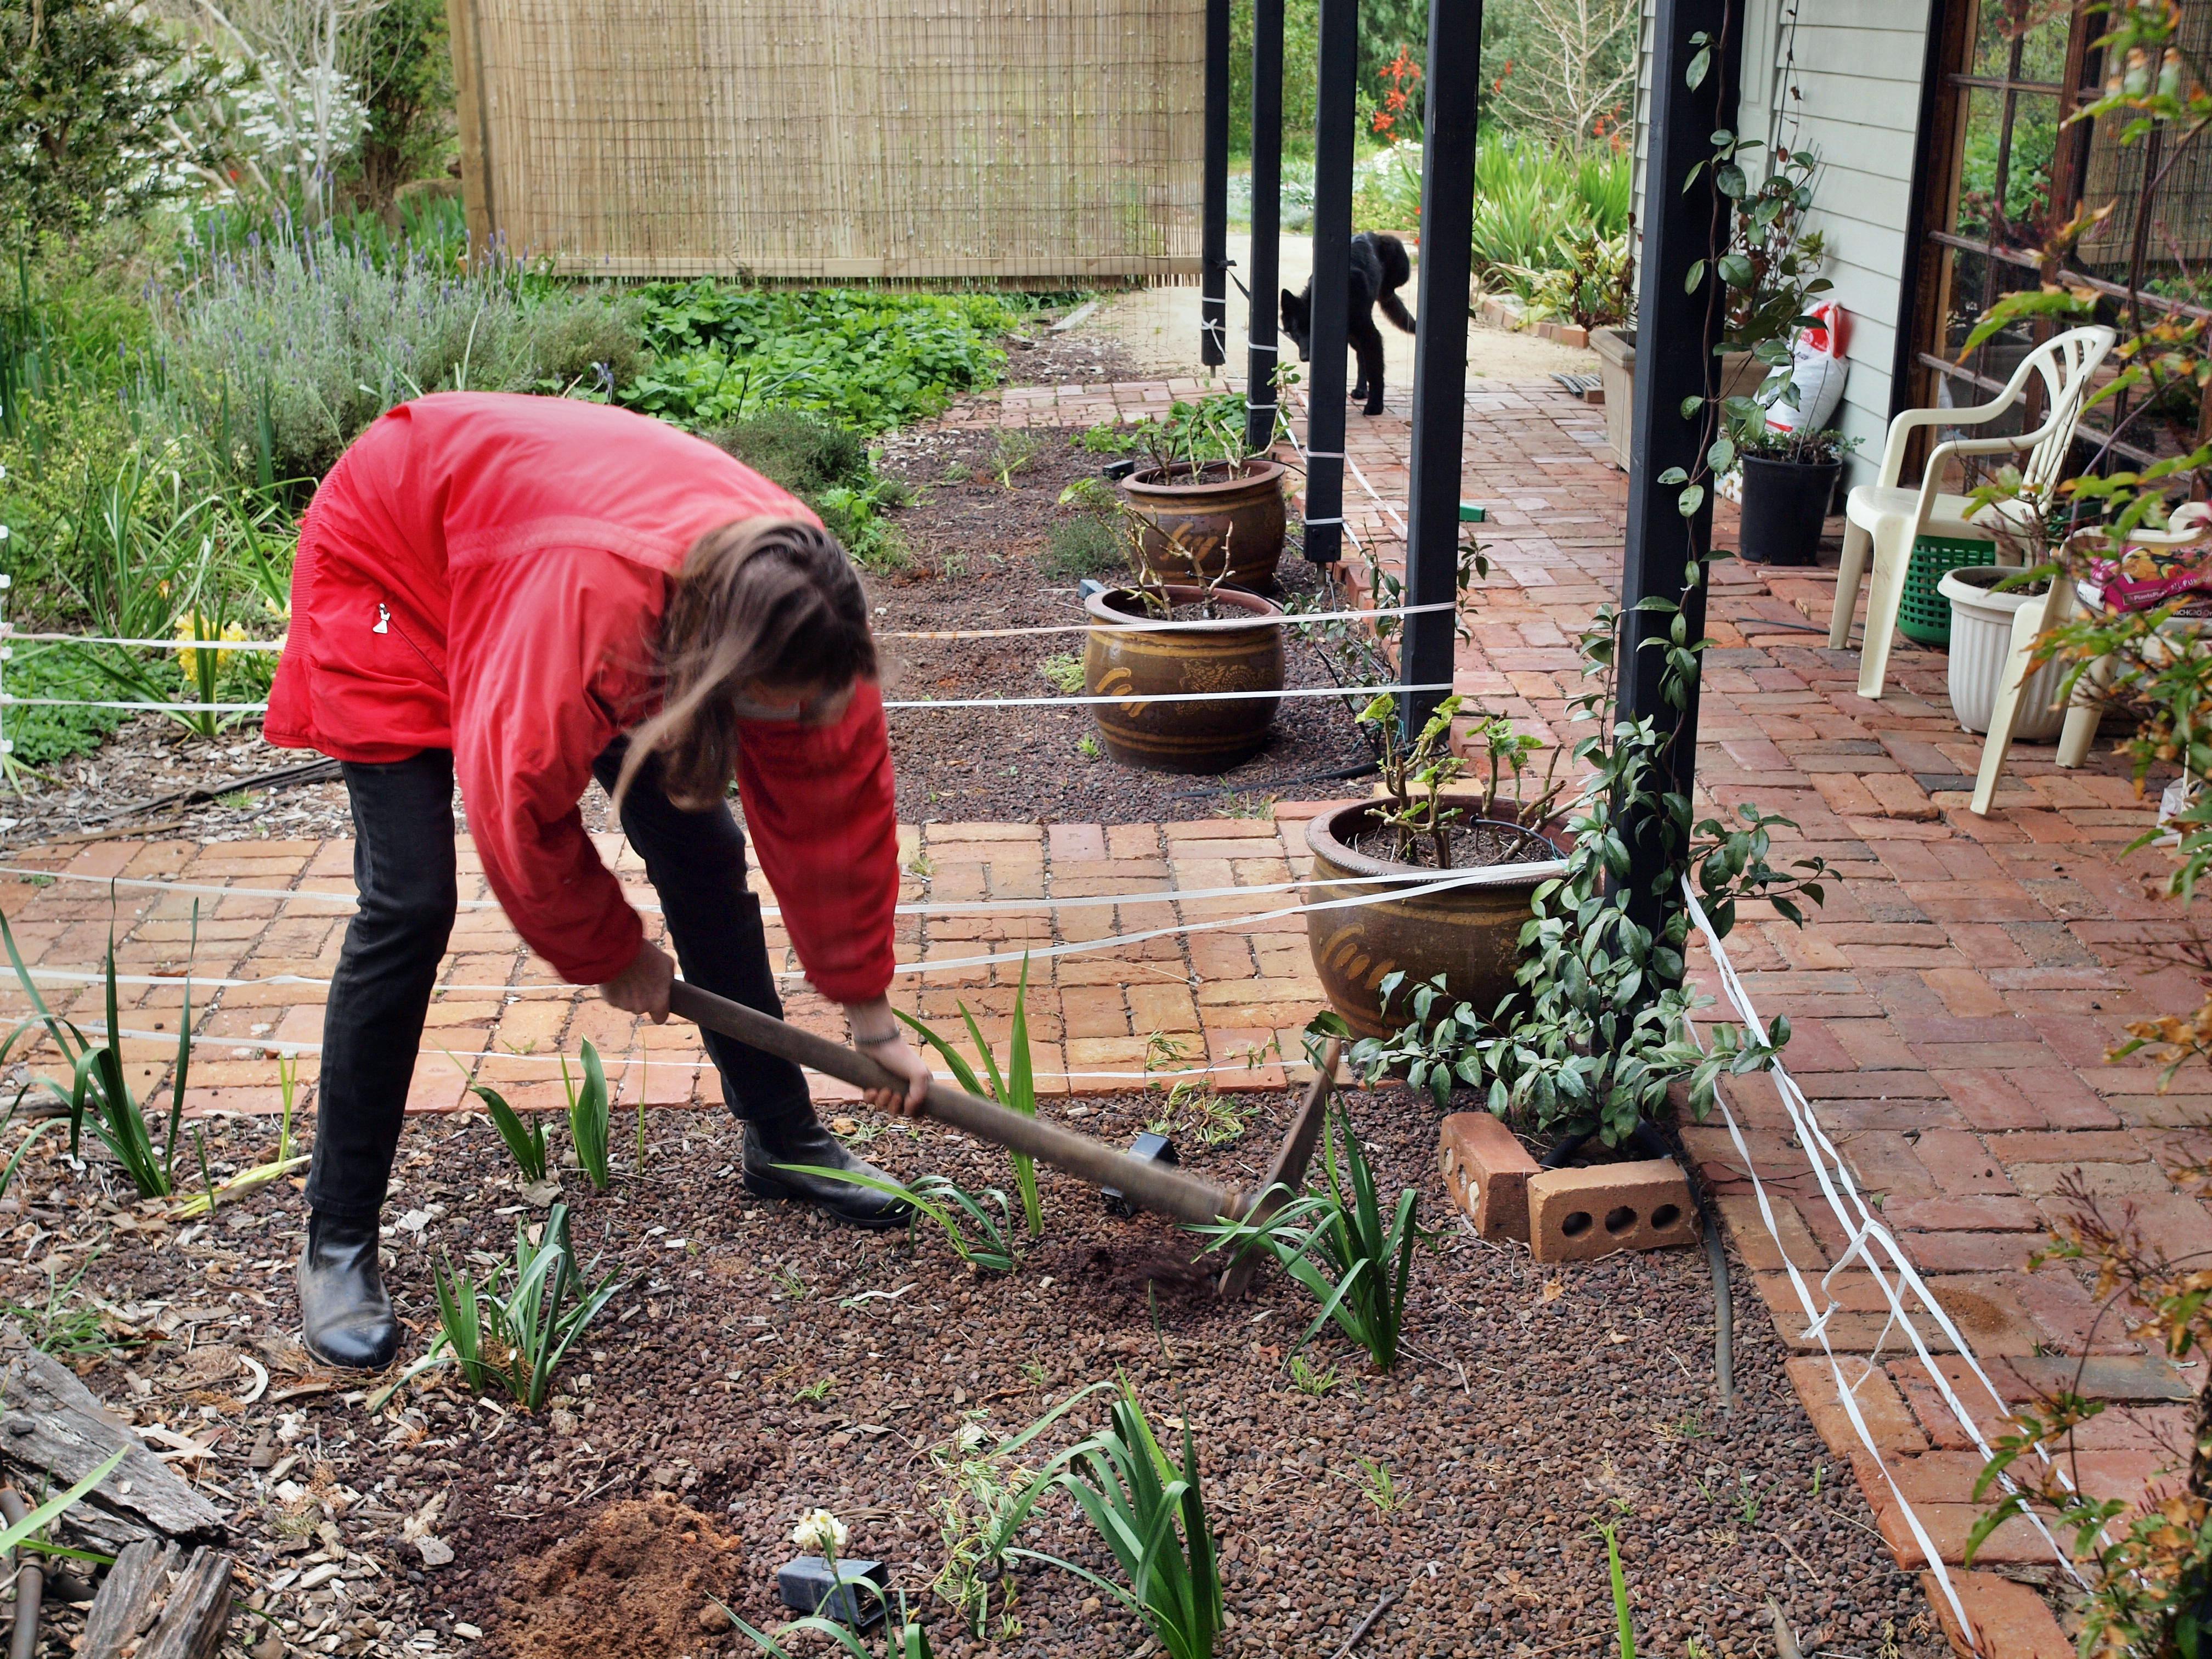 Yvonne-gardening-2.jpeg